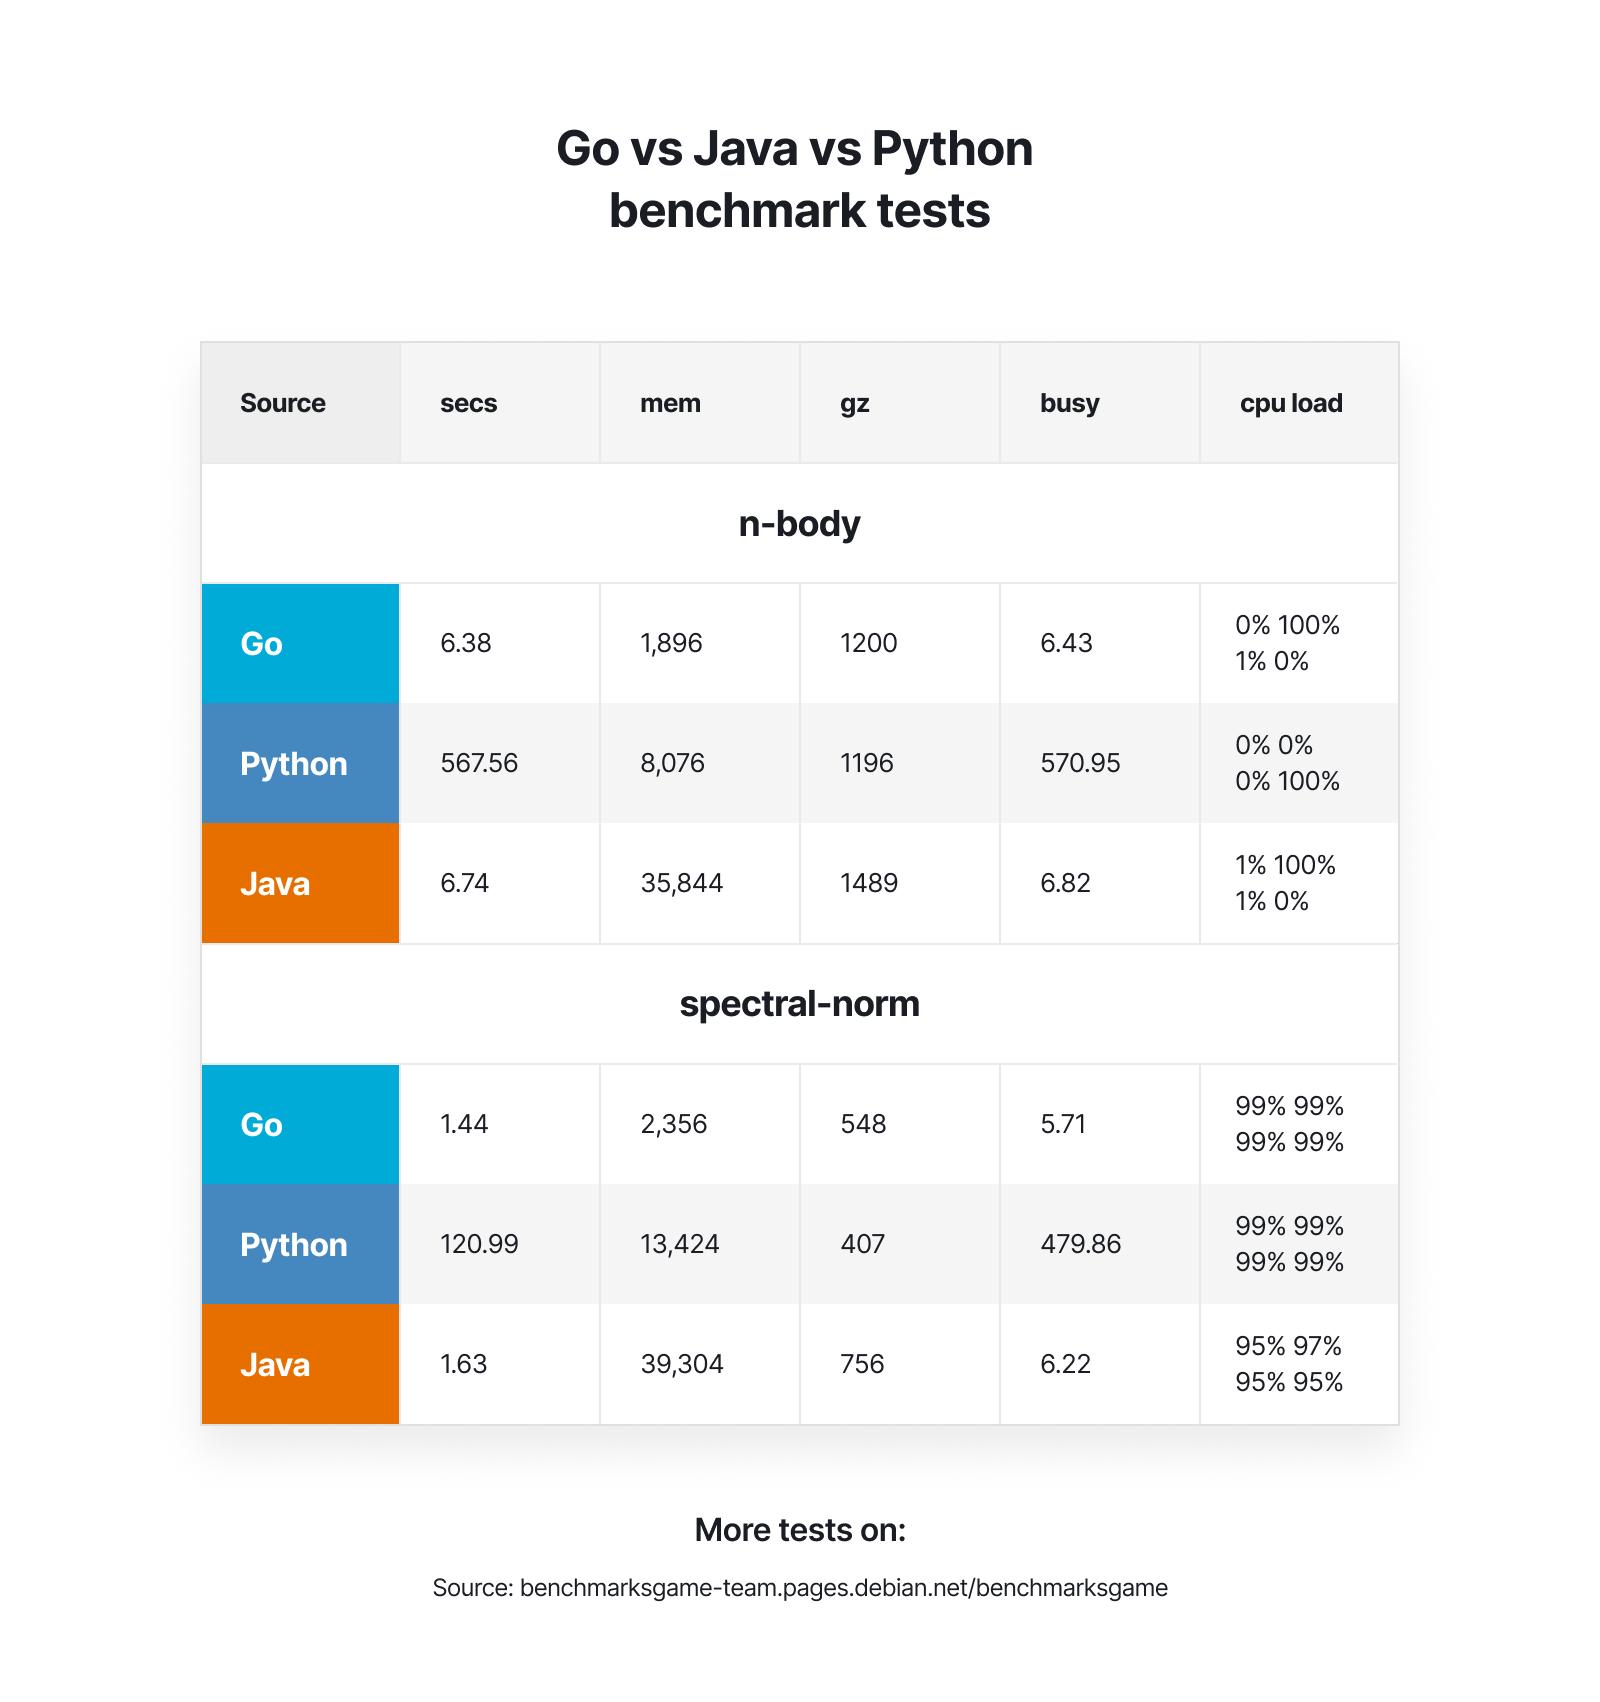 Go vs Java vs Python